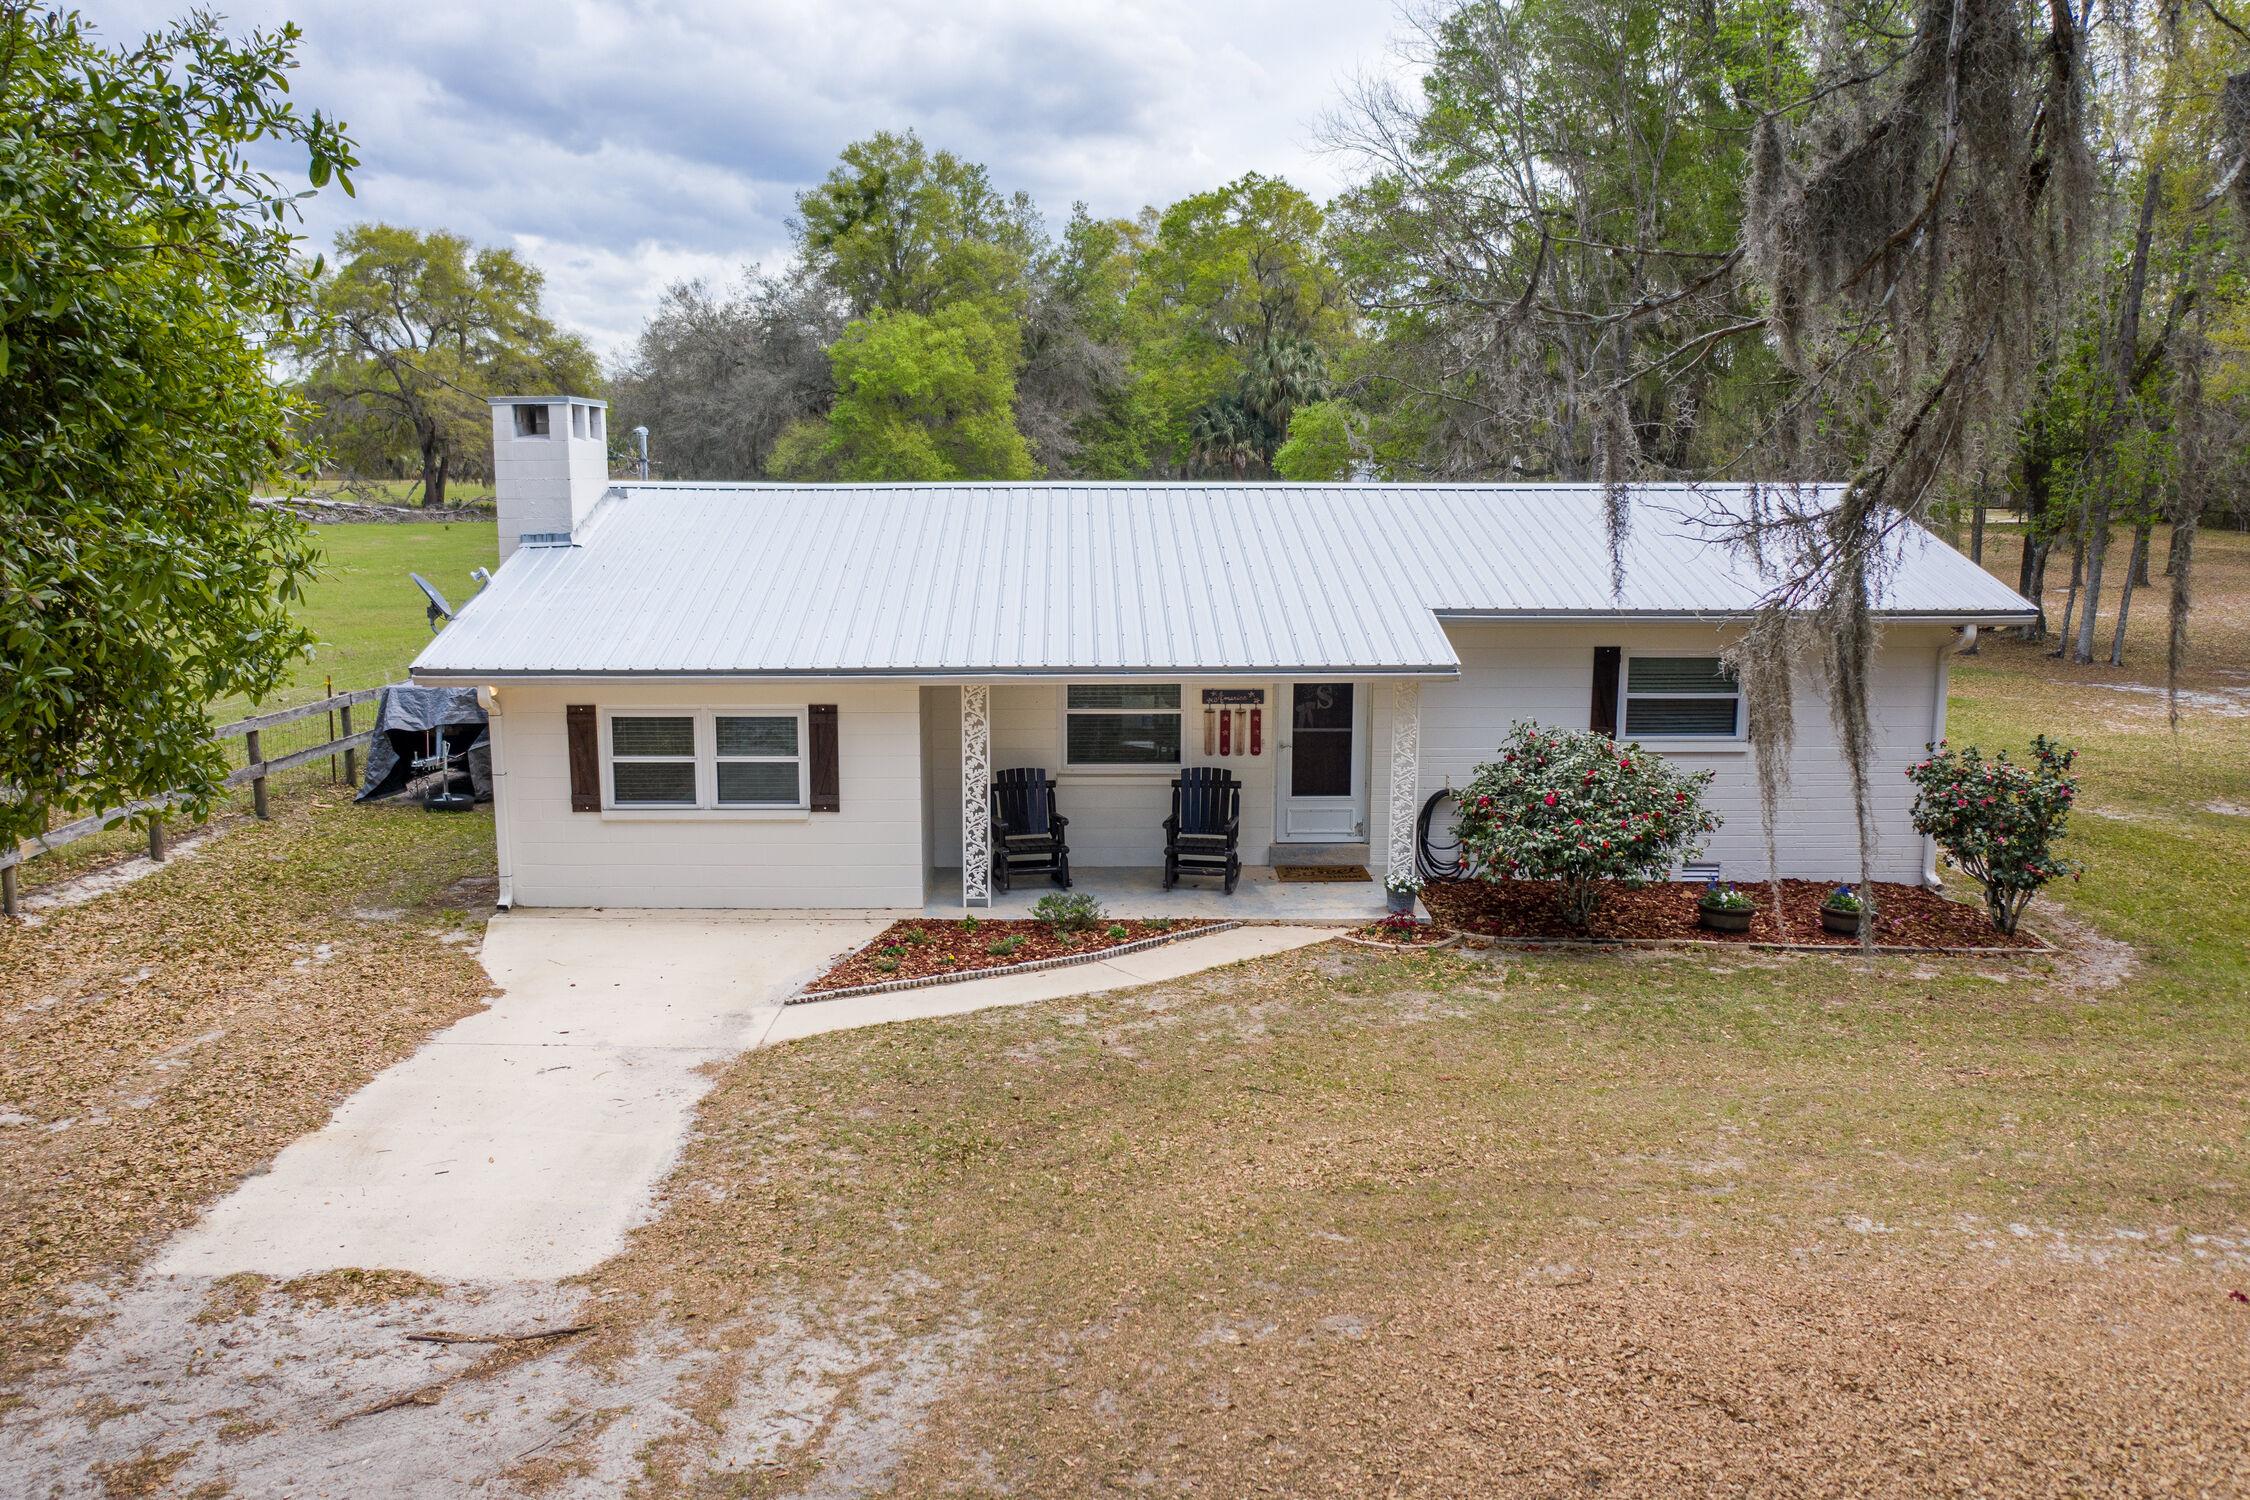 5353 E HWY 316 Citra, Florida, 32113 - Citra fl home for sale